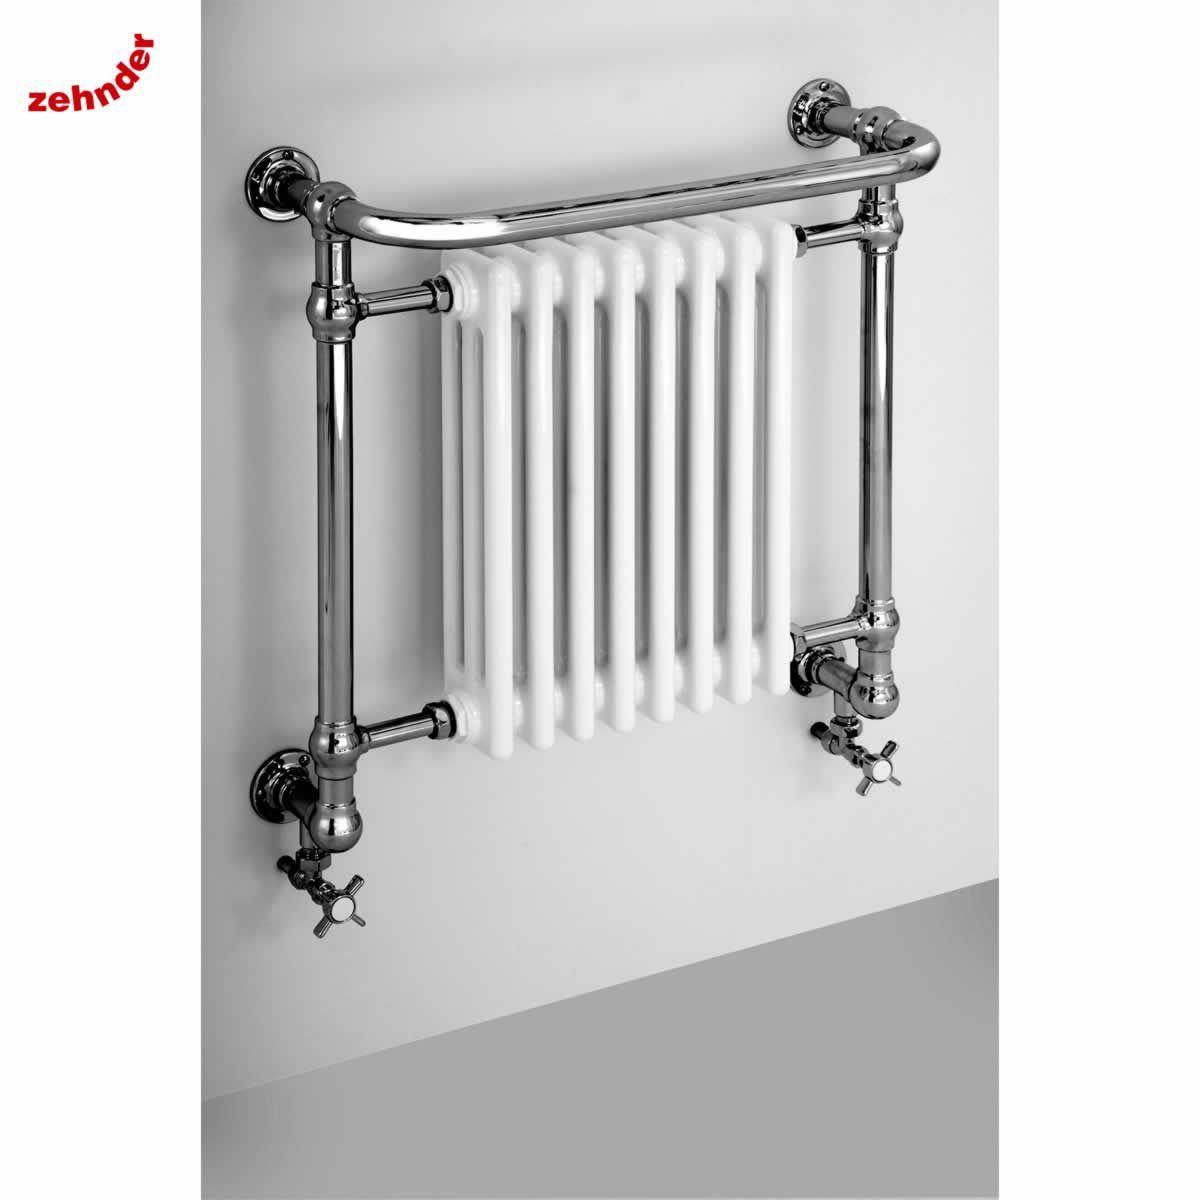 Small heated towel rails for bathrooms - Zehnder Lambeth Traditional Towel Radiator Ukbathrooms